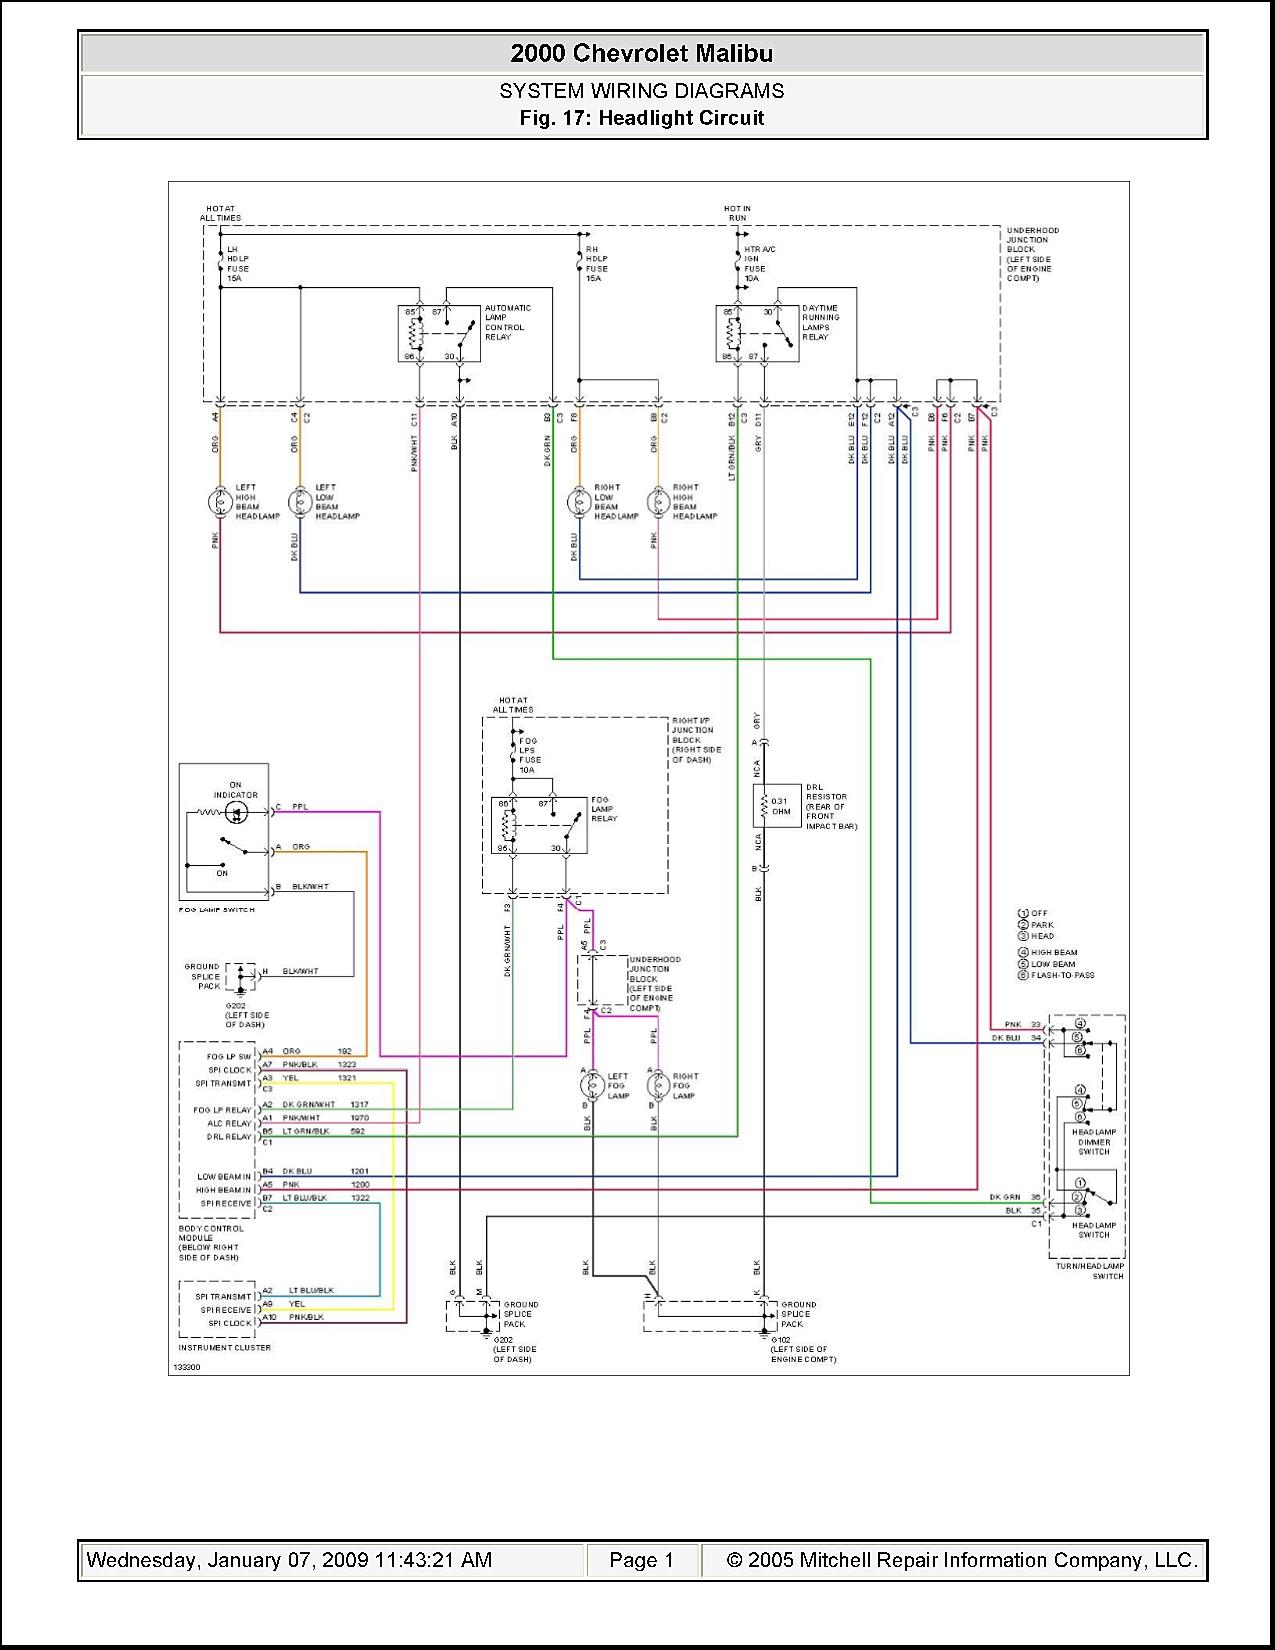 Stunning 05 hyundai accent radio wiring diagram photos best image breathtaking 2000 hyundai elantra radio wiring diagram gallery publicscrutiny Gallery